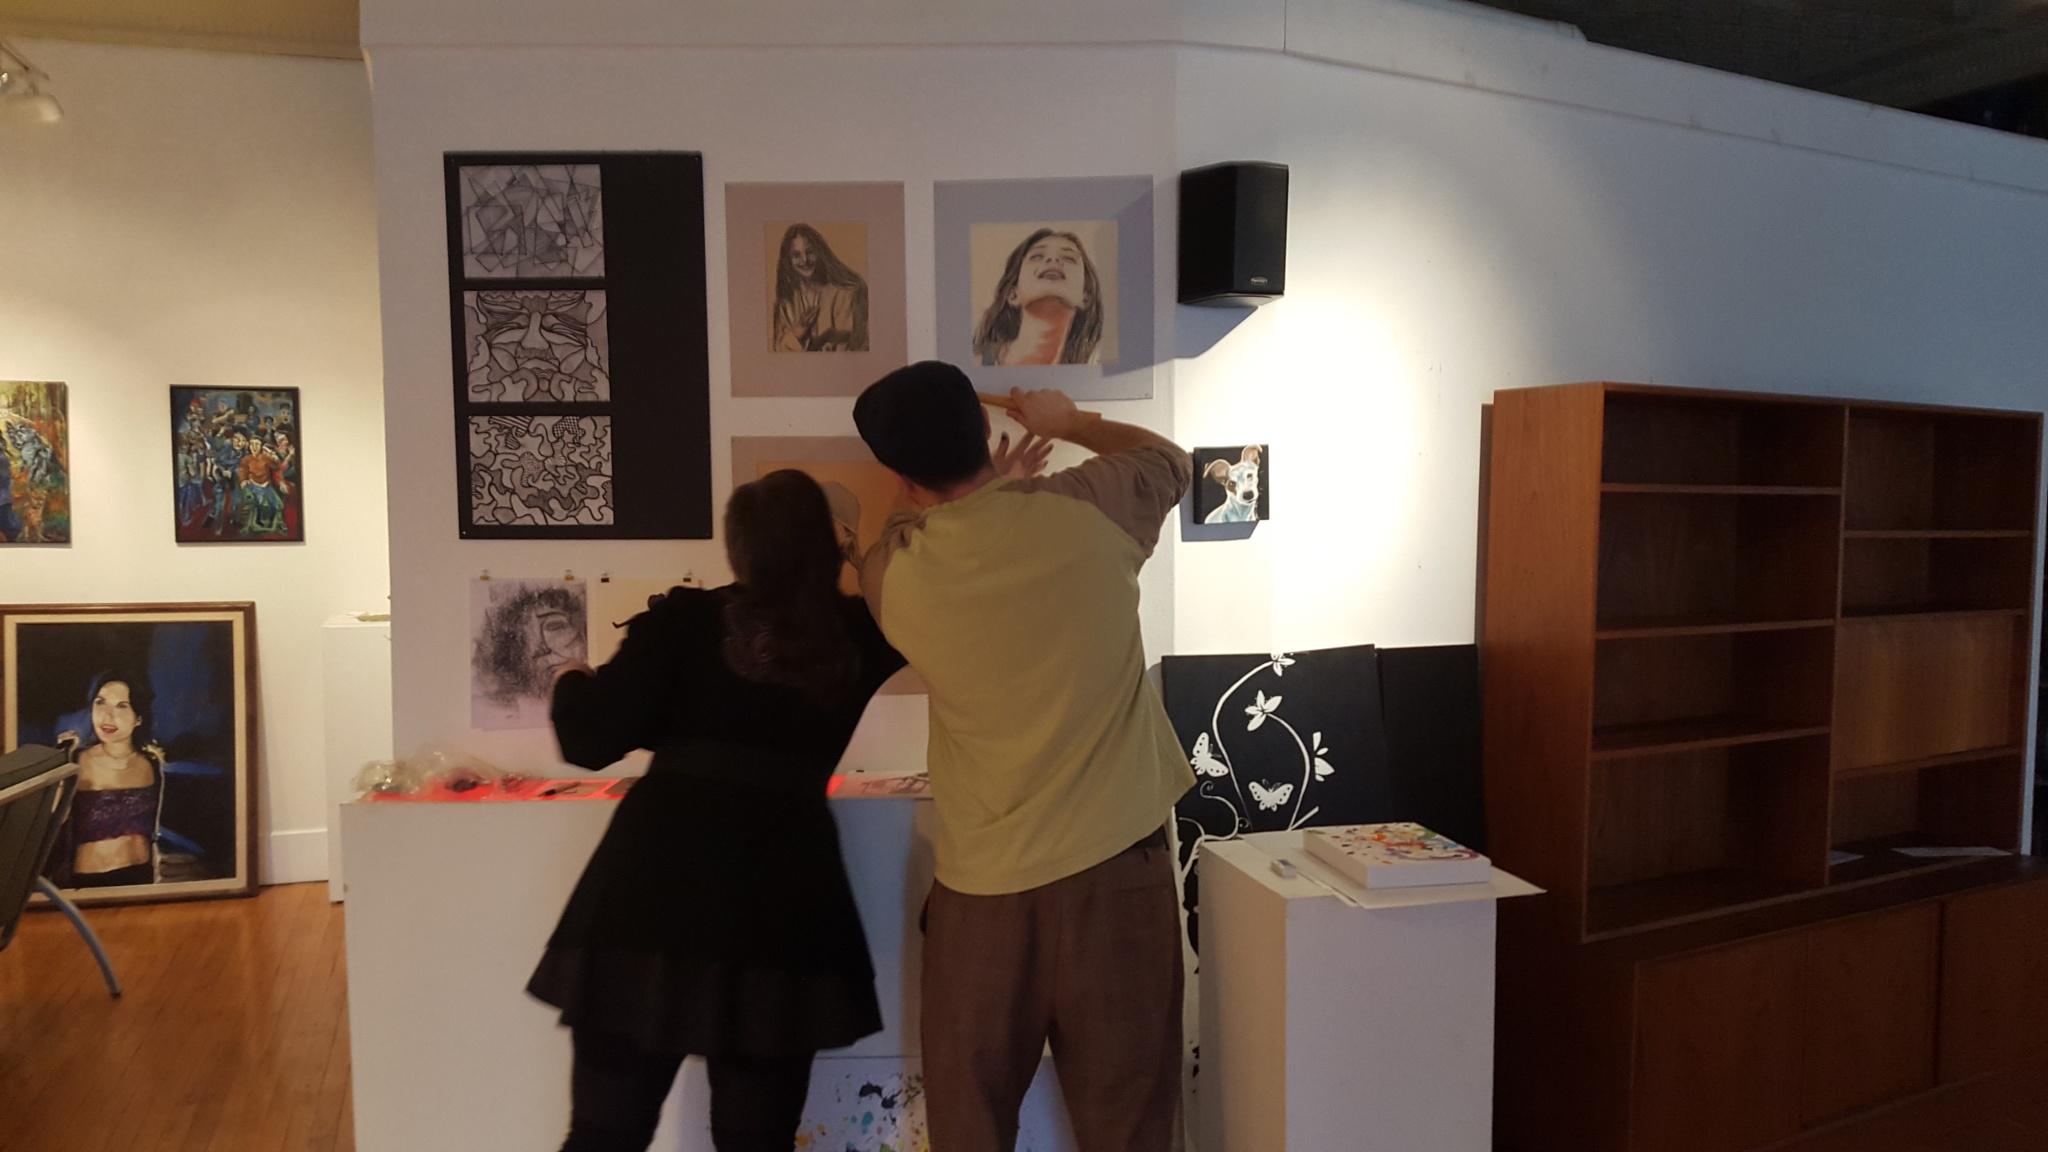 Art work going up by RegSoper